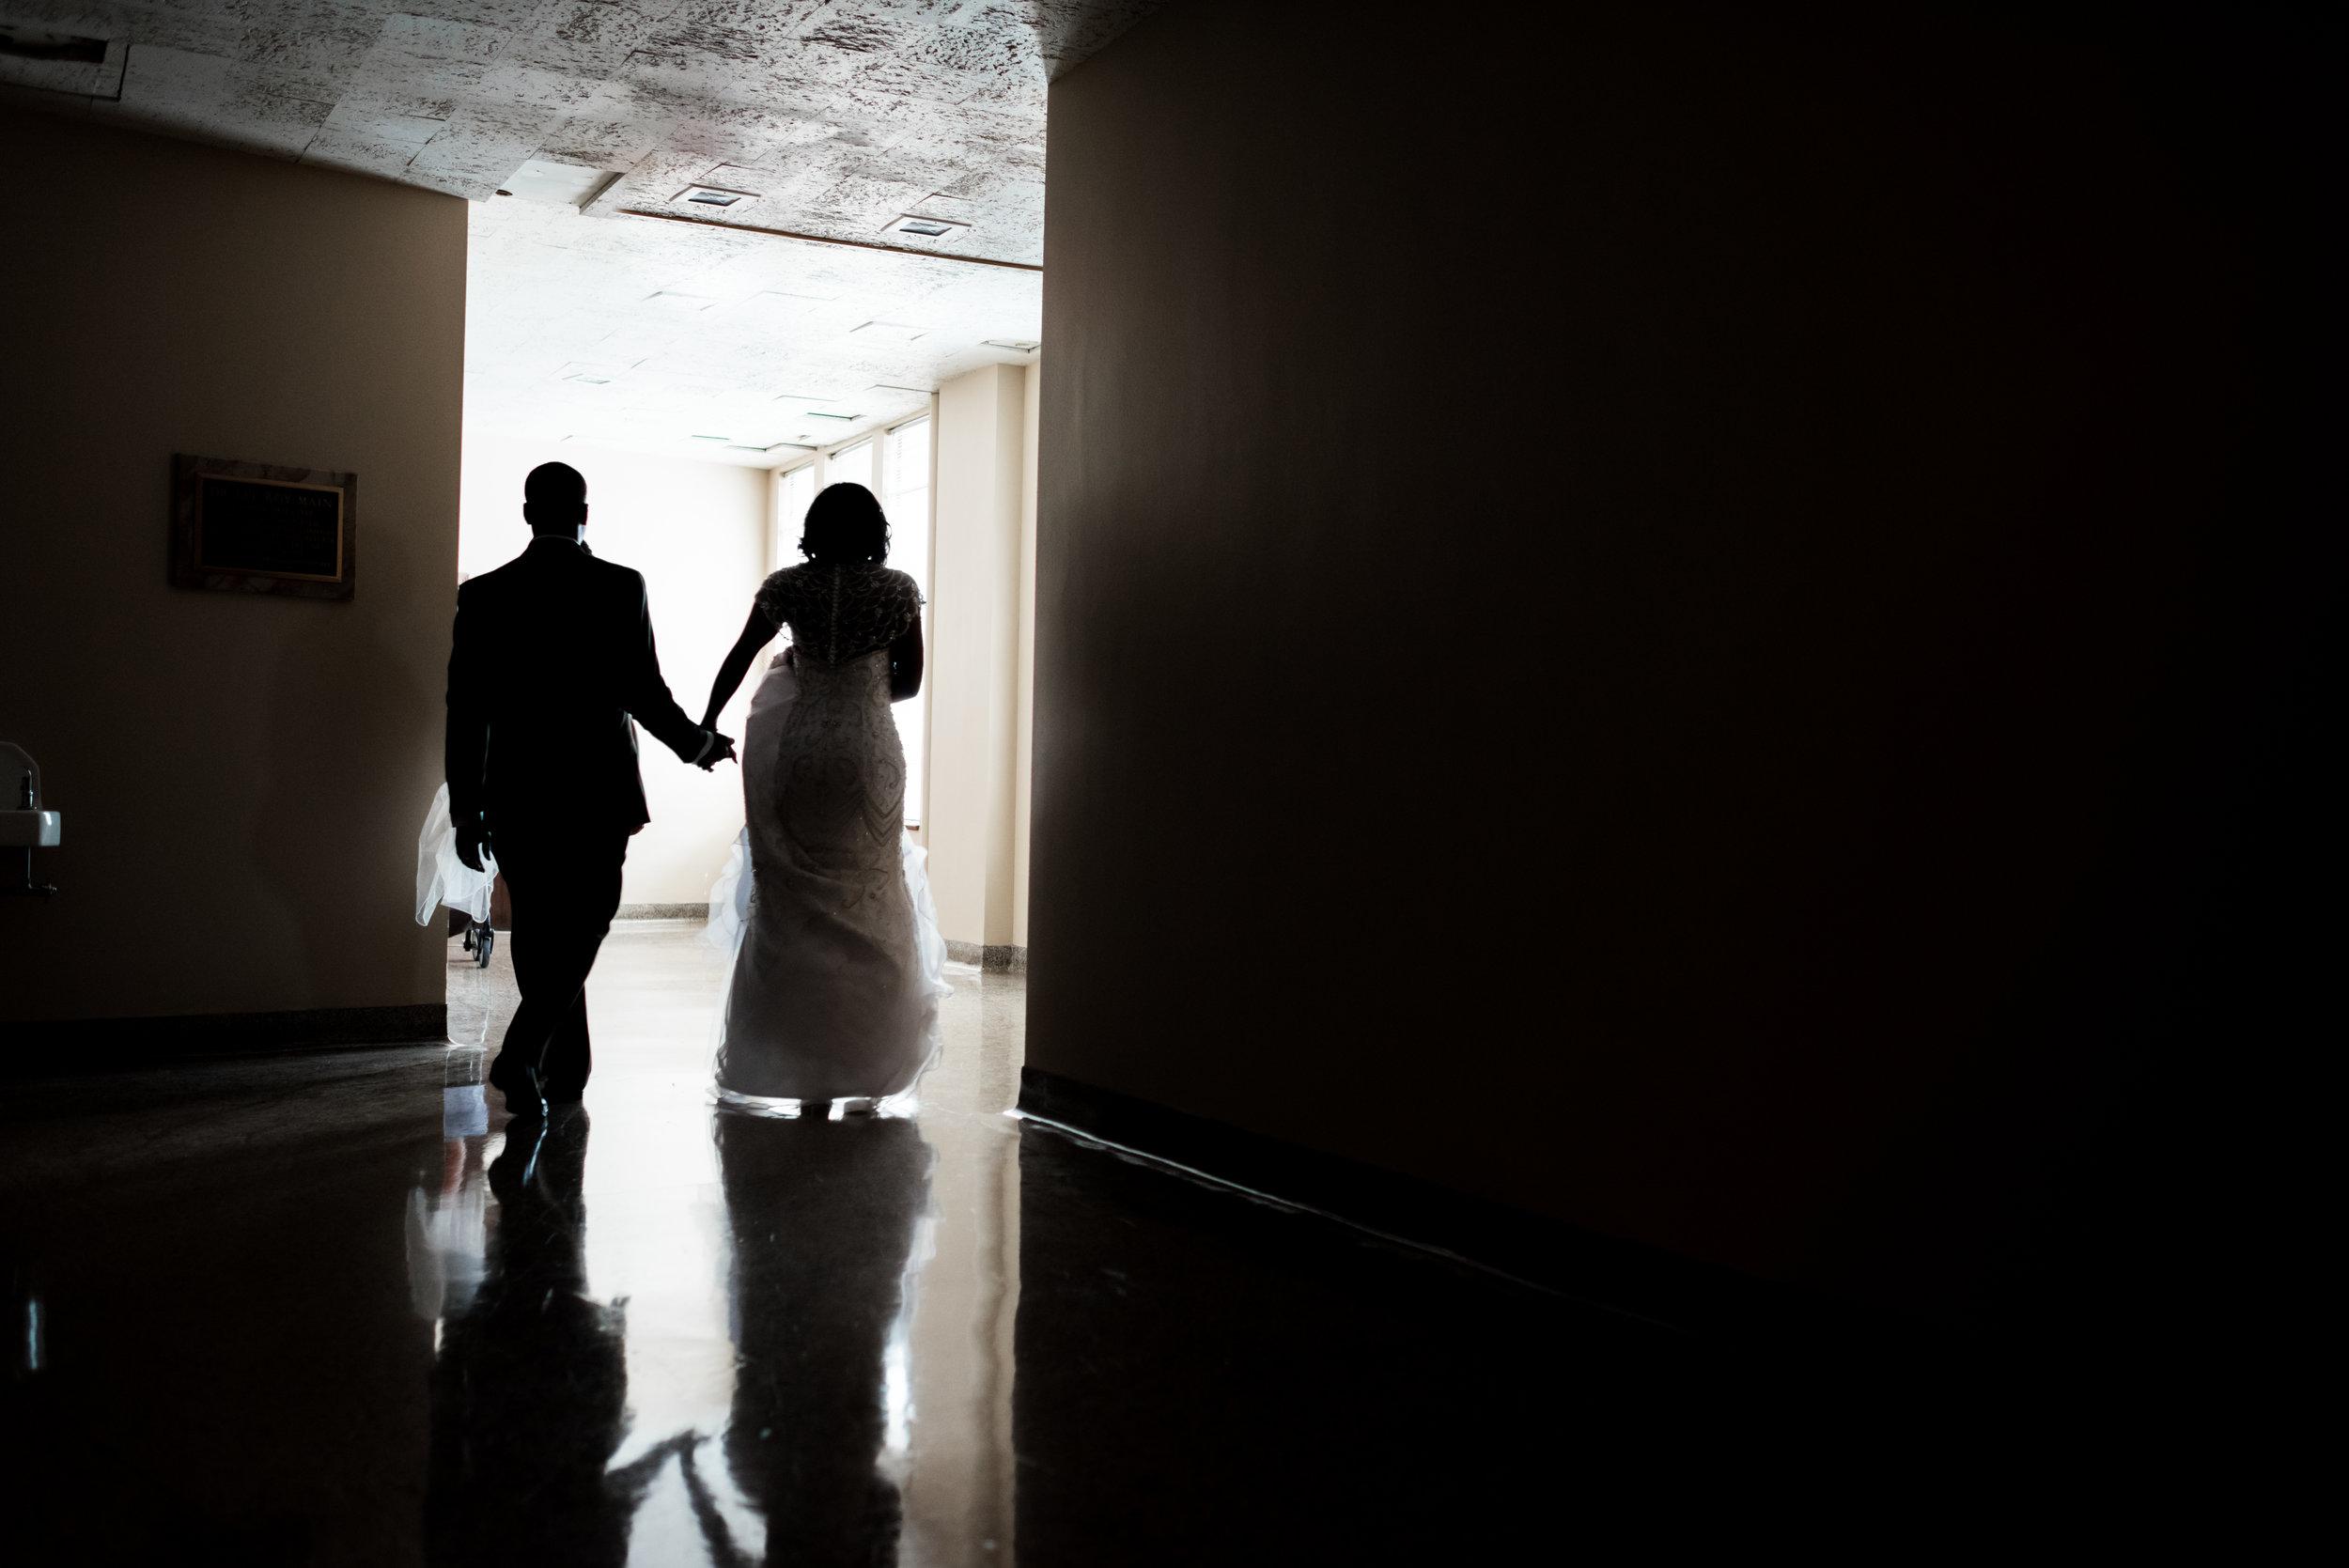 st-louis-wedding-photographer-third-baptist-church-442.jpg